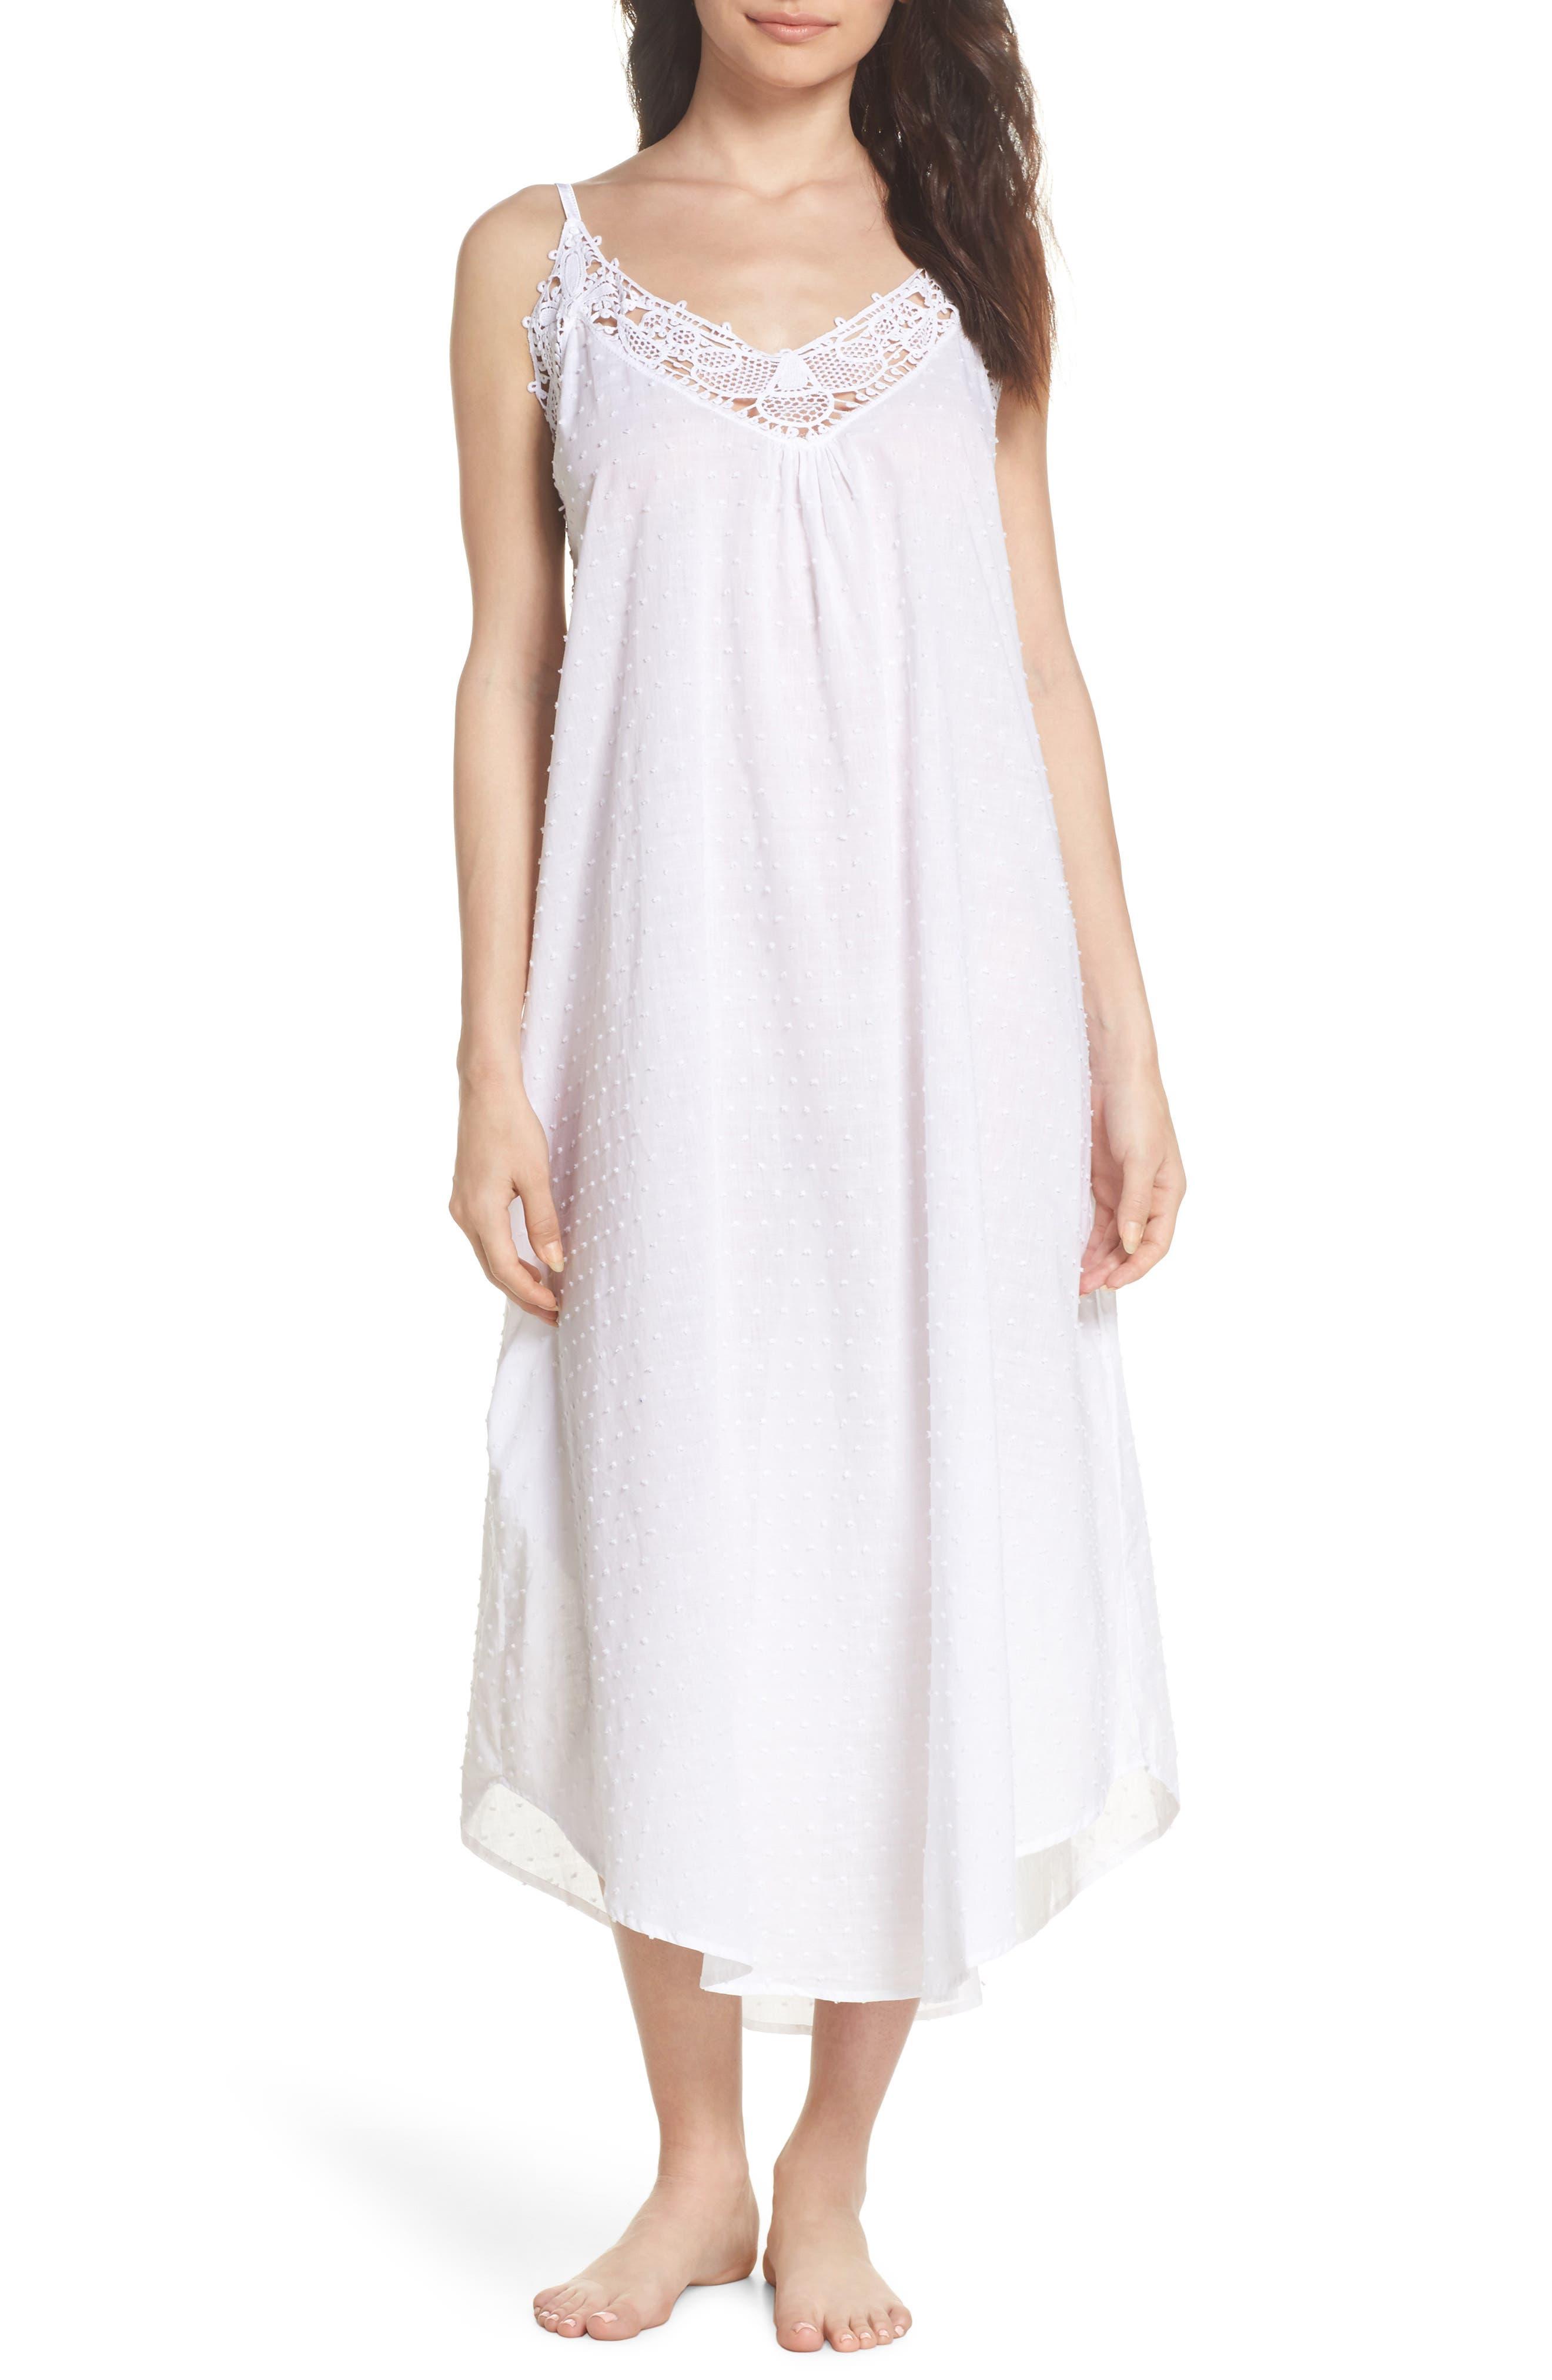 Swiss Dot Nightgown,                             Main thumbnail 1, color,                             White